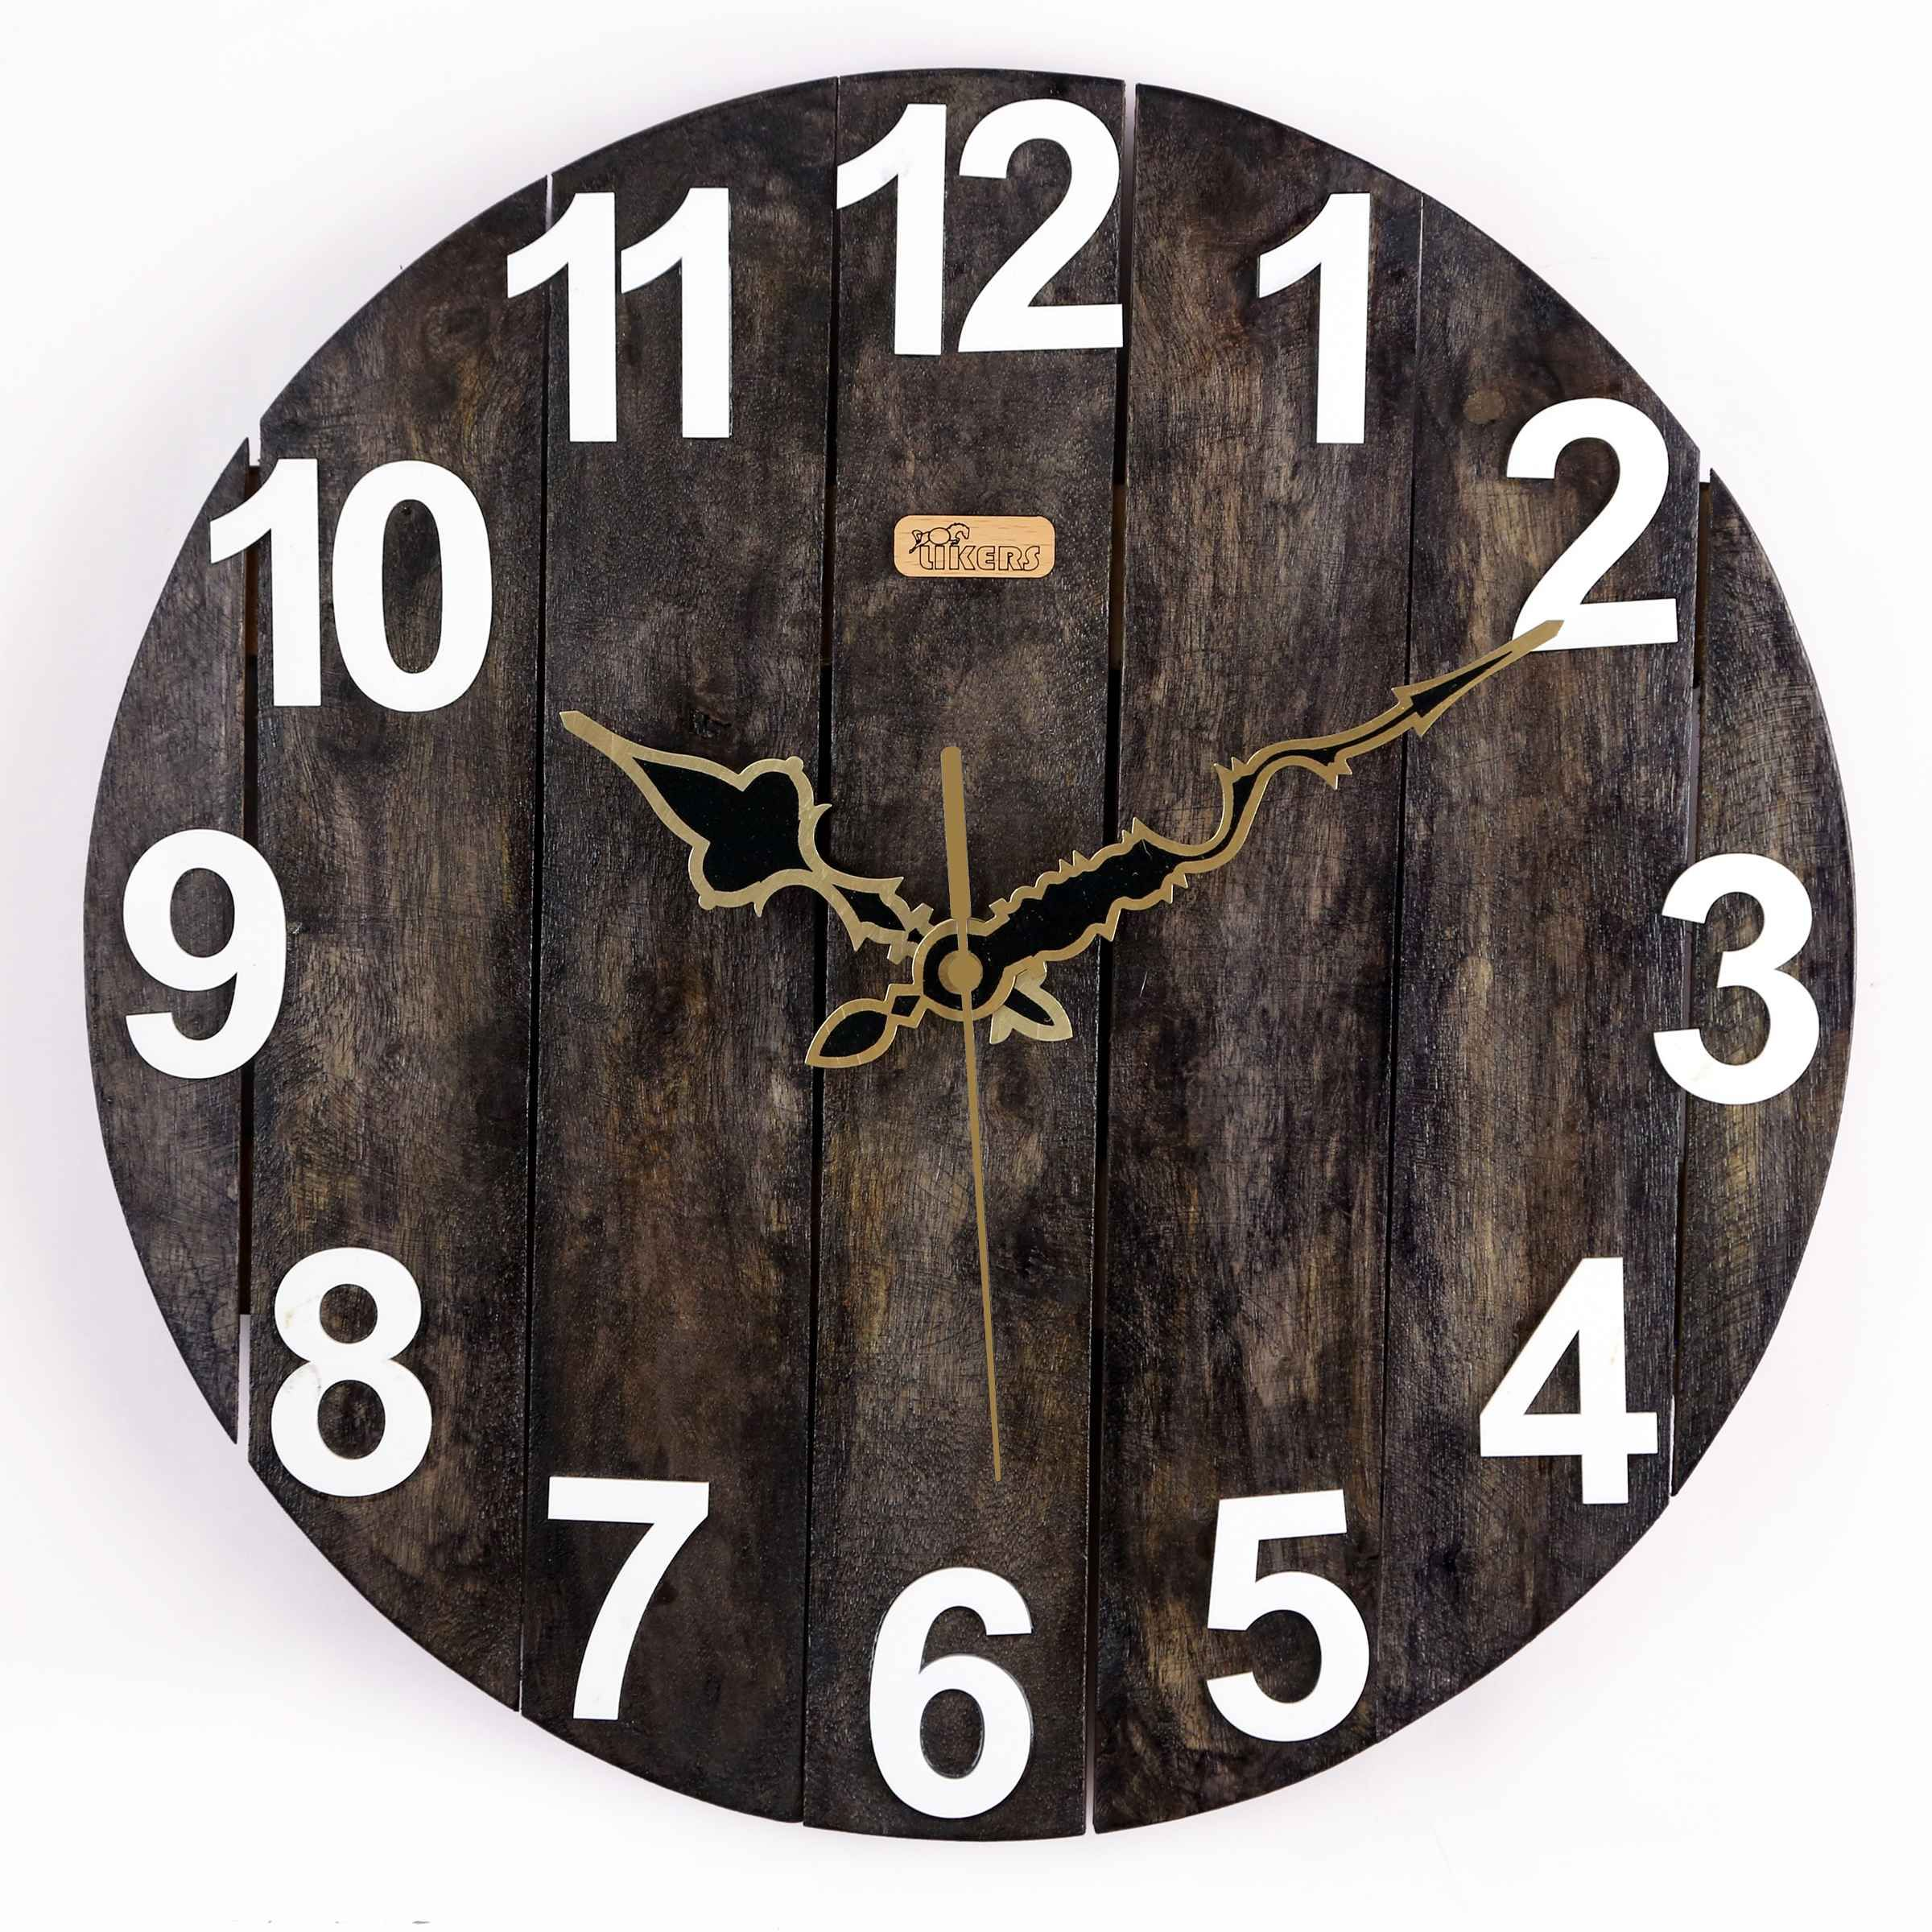 Ajanta Wall Clock Latest Design Images